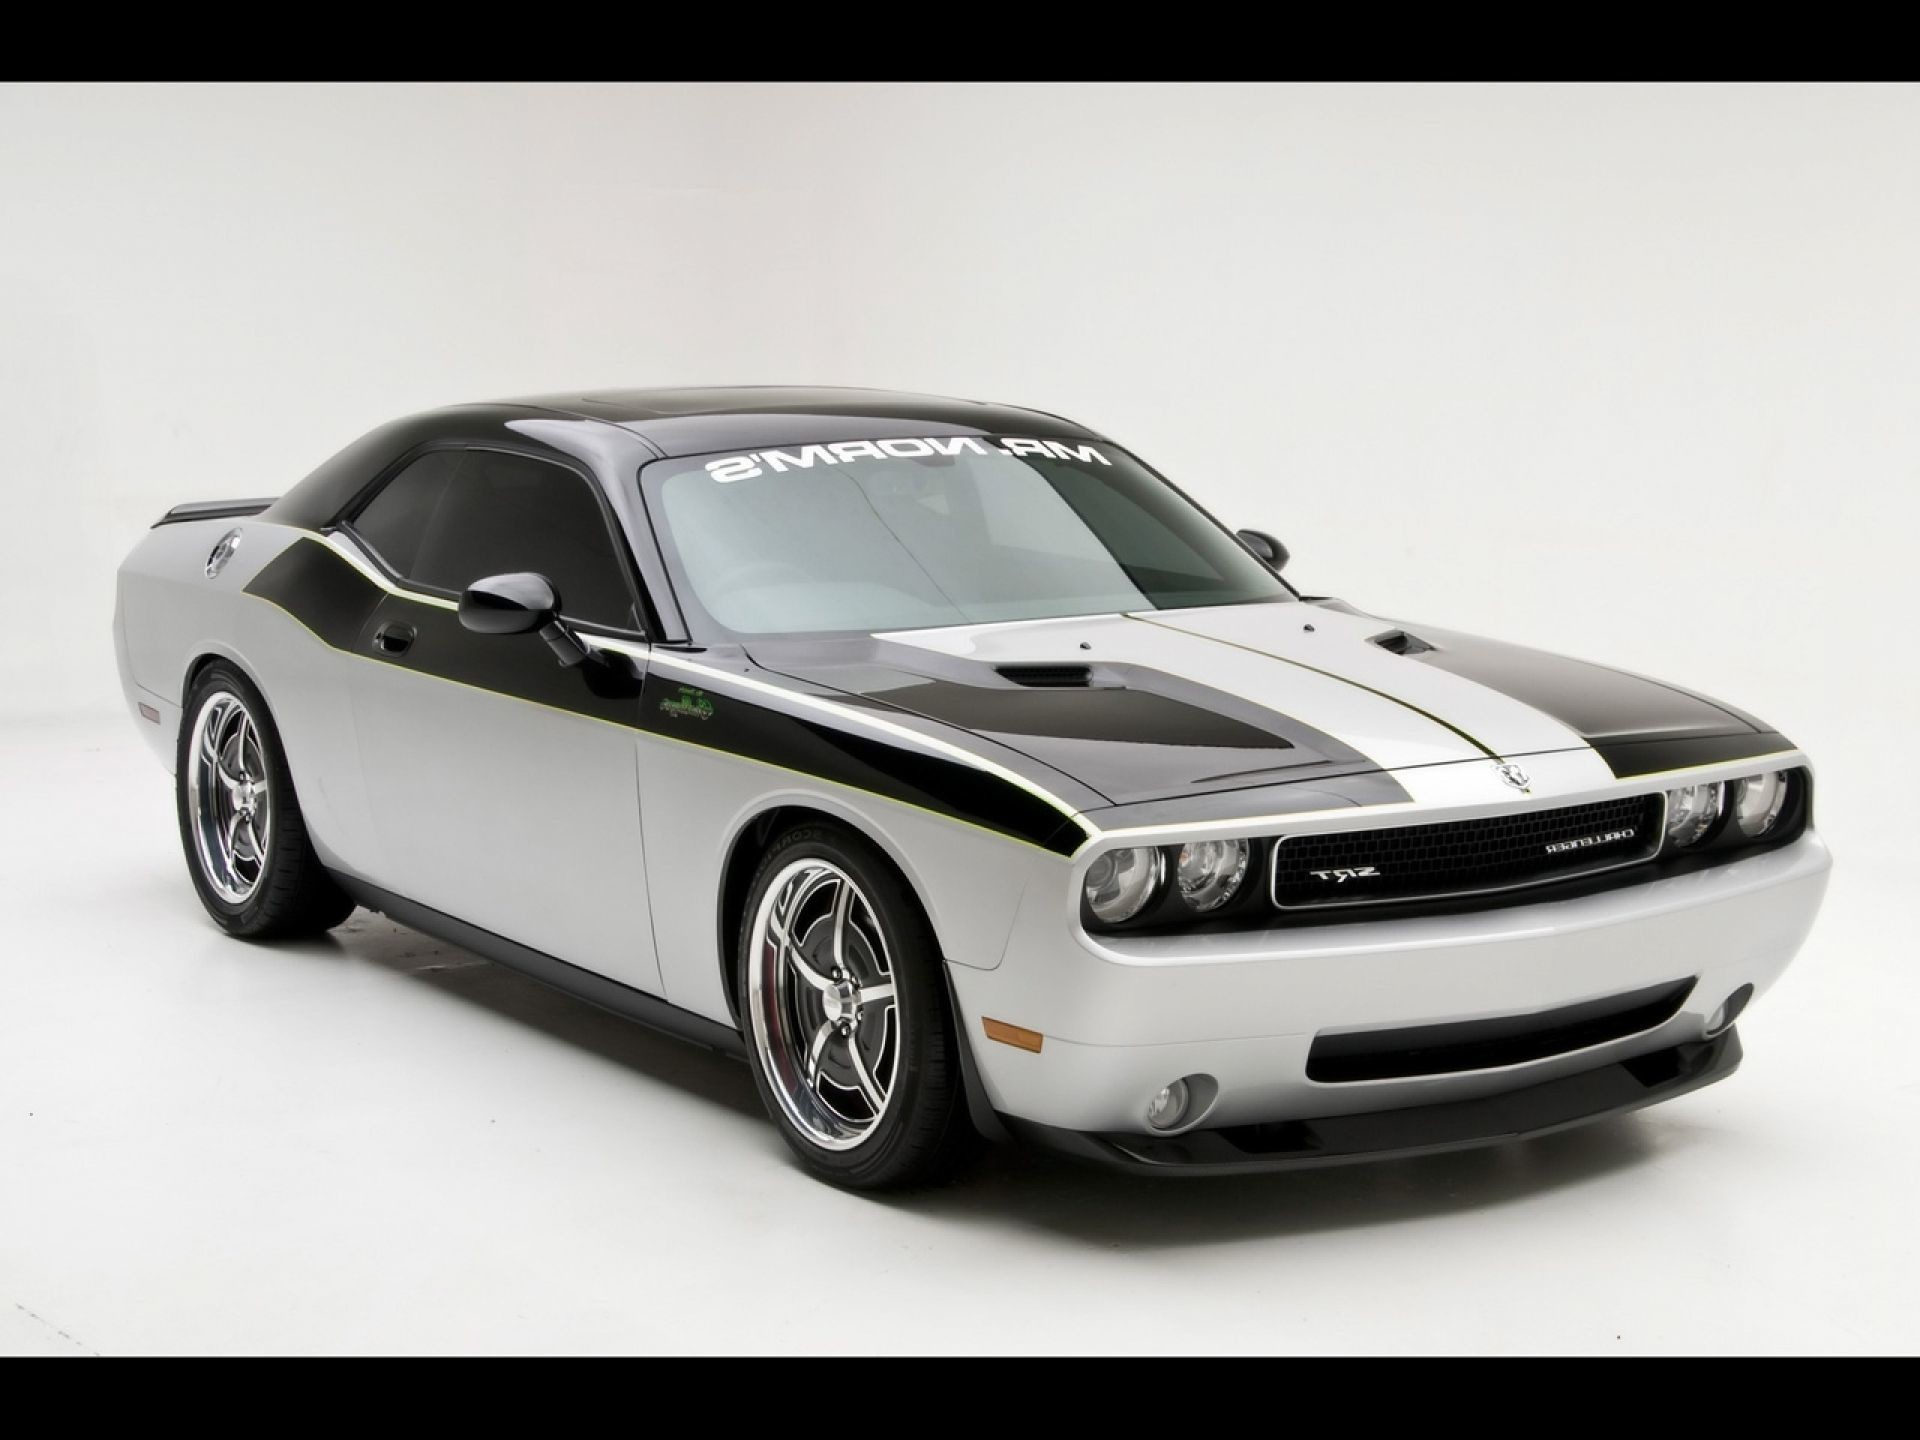 2015 Dodge Challenger Hellcat Wallpaper Black …